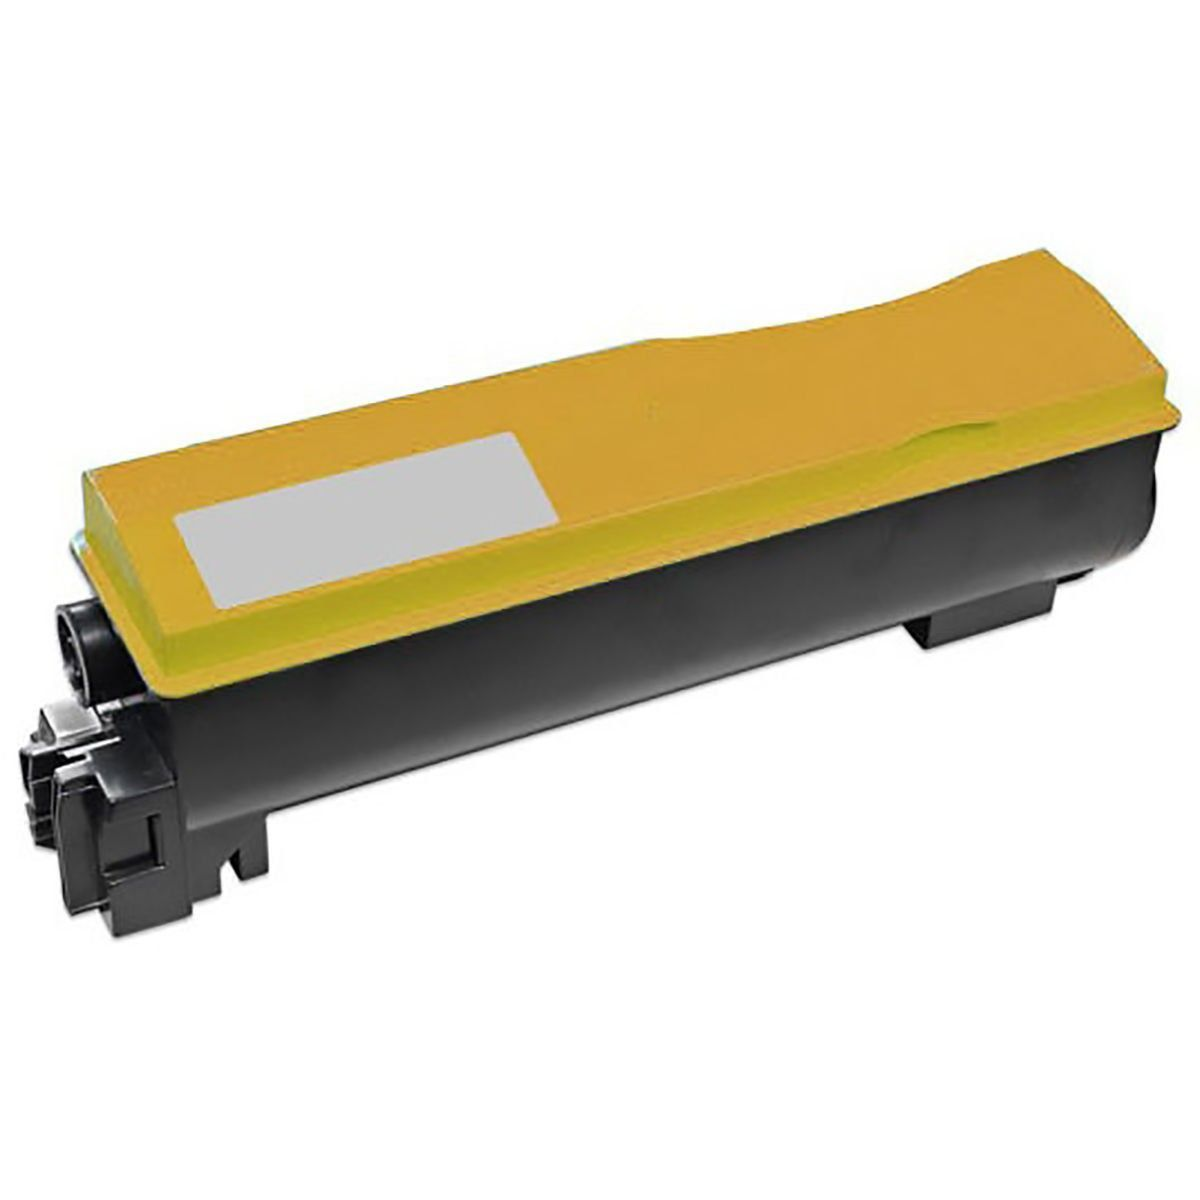 Compatível: Toner TK-582Y TK582 para Kyocera FS-C5150dn FS-C5150 P6021cdn P6021 FSC5150dn FSC5150 / Amarelo / 2.800